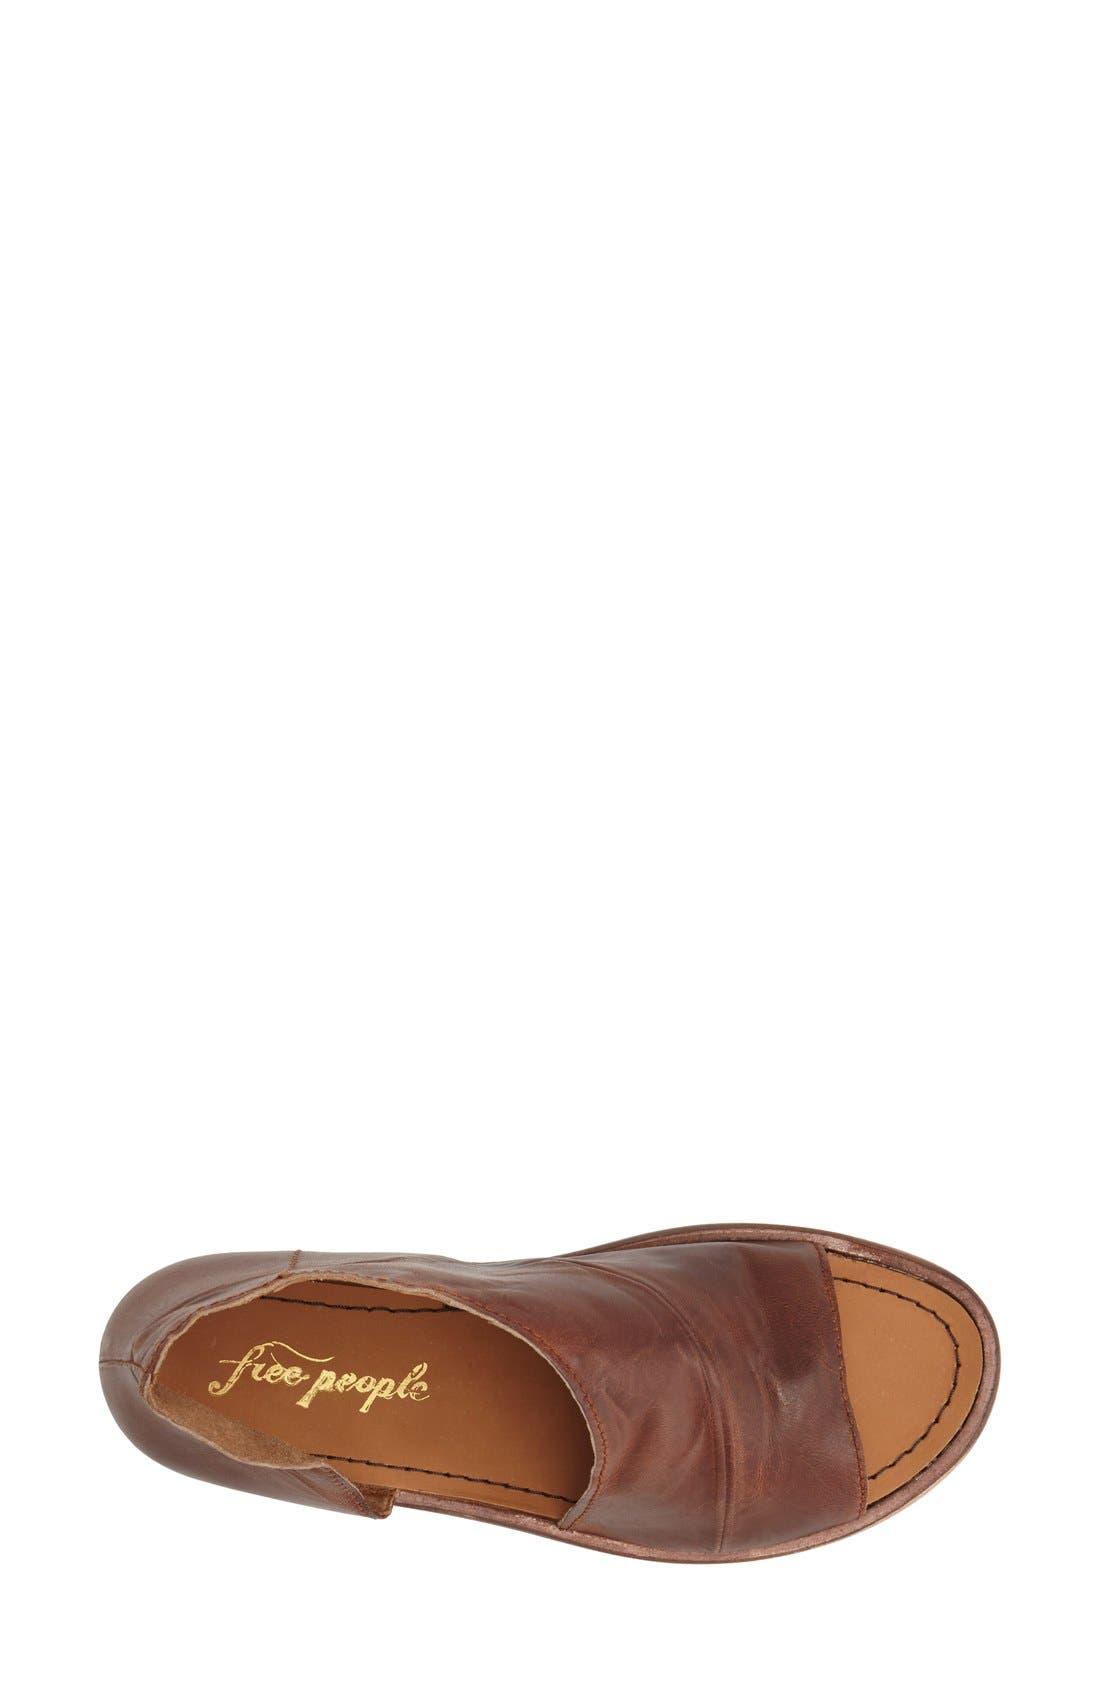 'Mont Blanc' Asymmetrical Sandal,                             Alternate thumbnail 50, color,